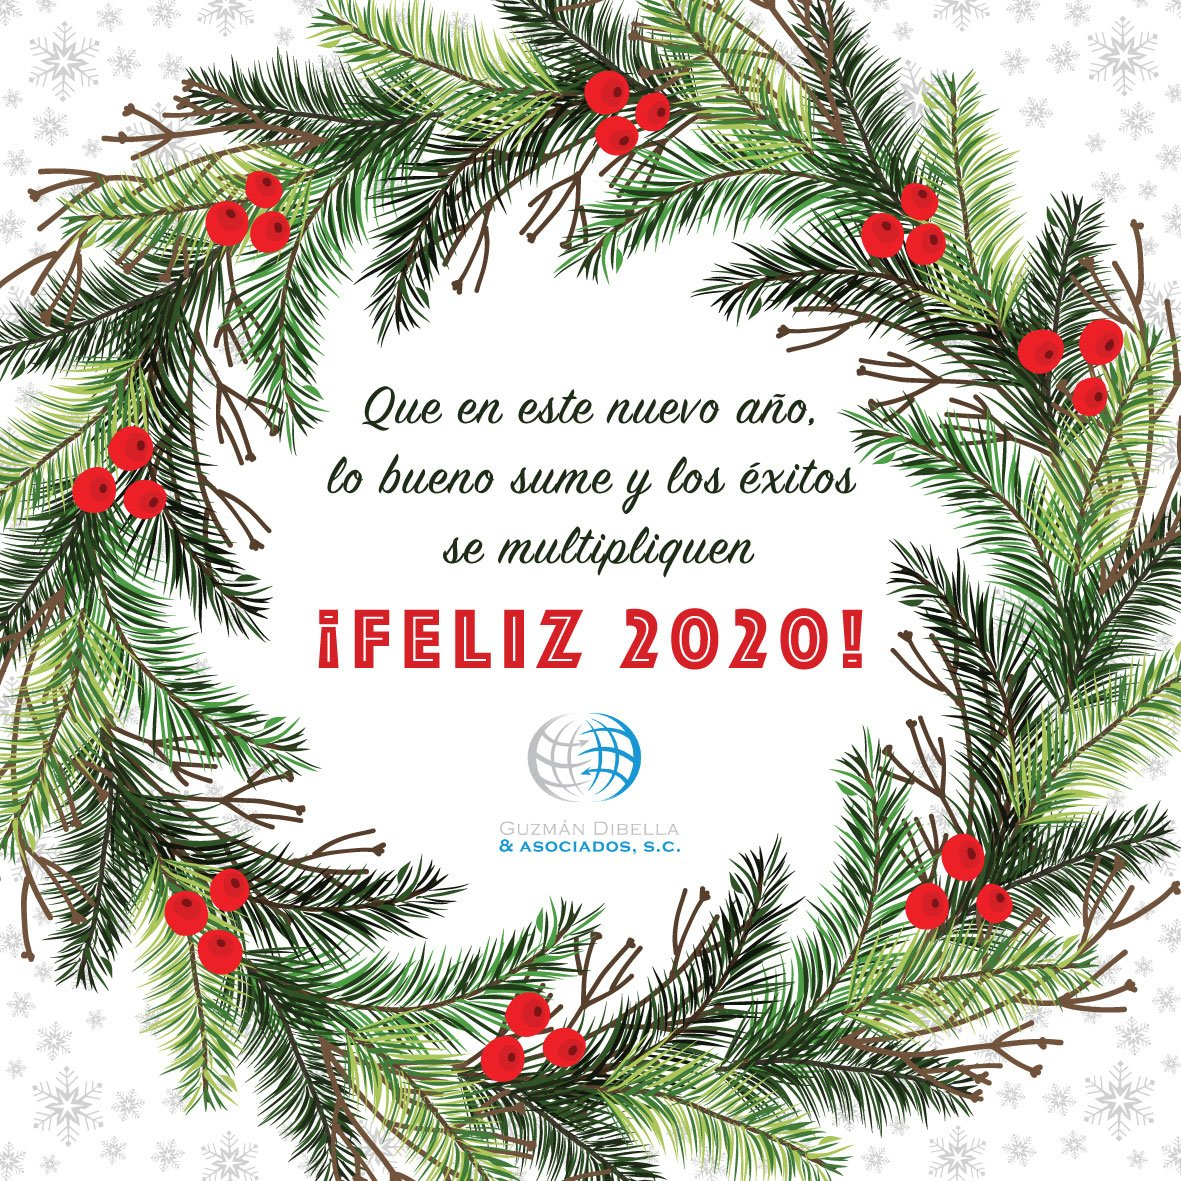 Guzmán Dibella & Asociados les desea un feliz 2020